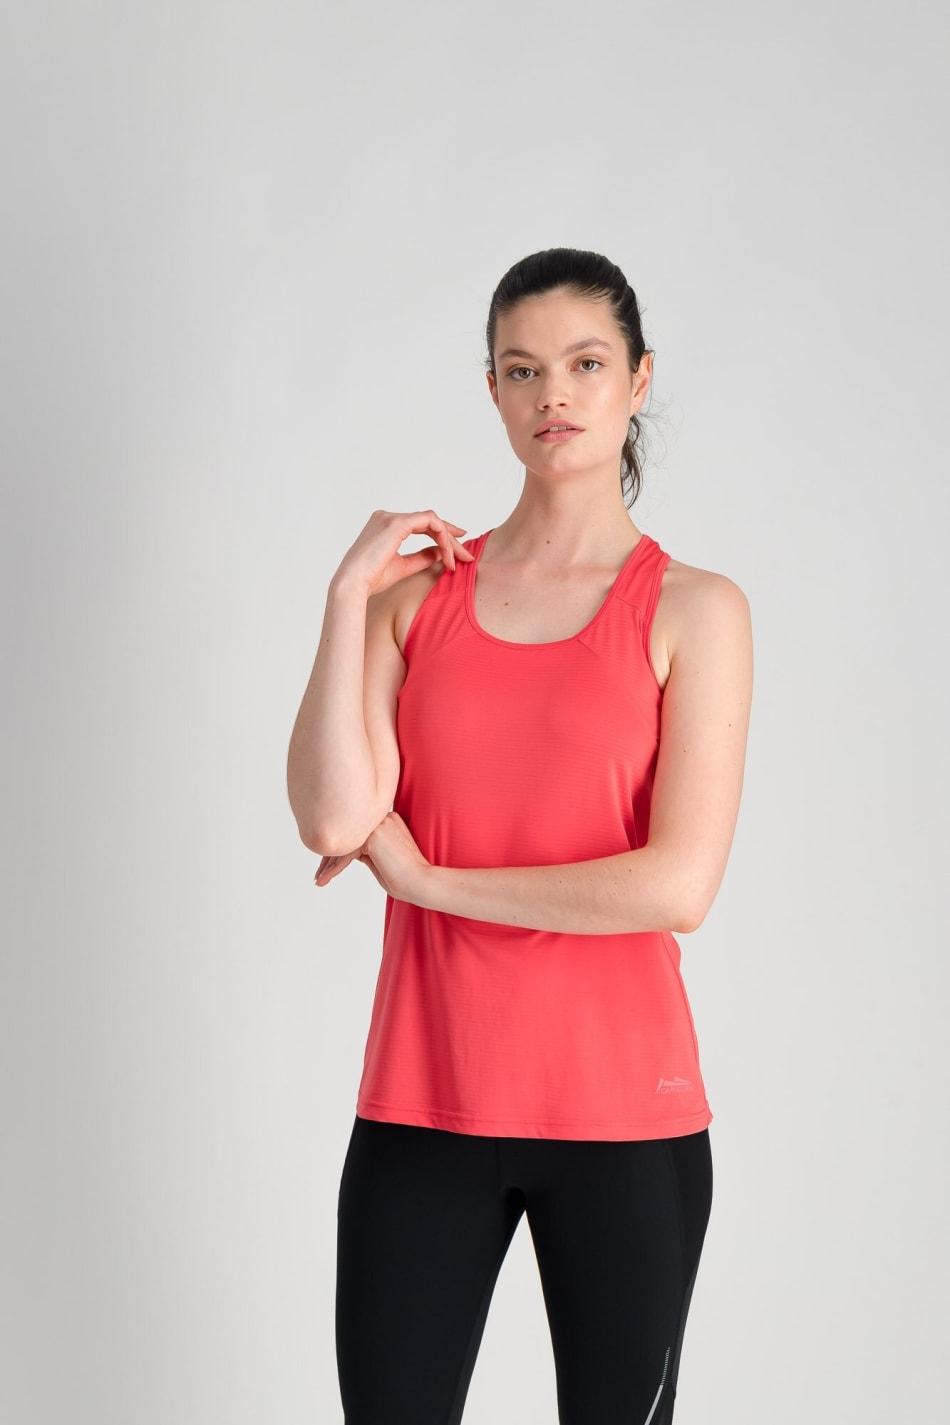 Capestorm Women's Stride Run Vest, product, variation 4